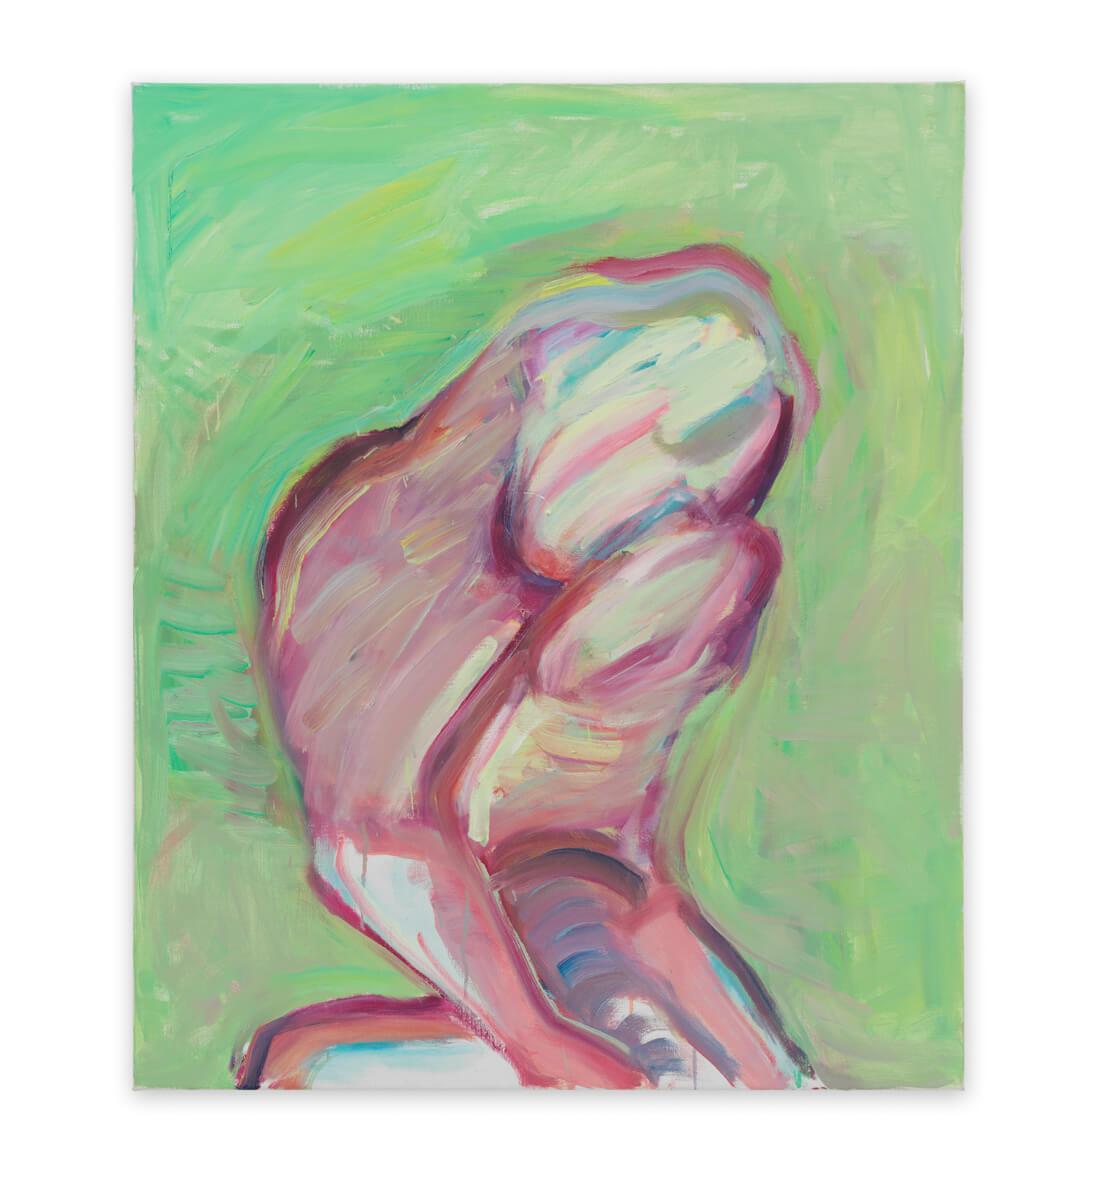 Hellgrünes Selbst / Bedrücktes Selbst / Malflussselbstportrait <br>(Light-Green Self / Sad Self / Self – Portrait in Paint Flow)